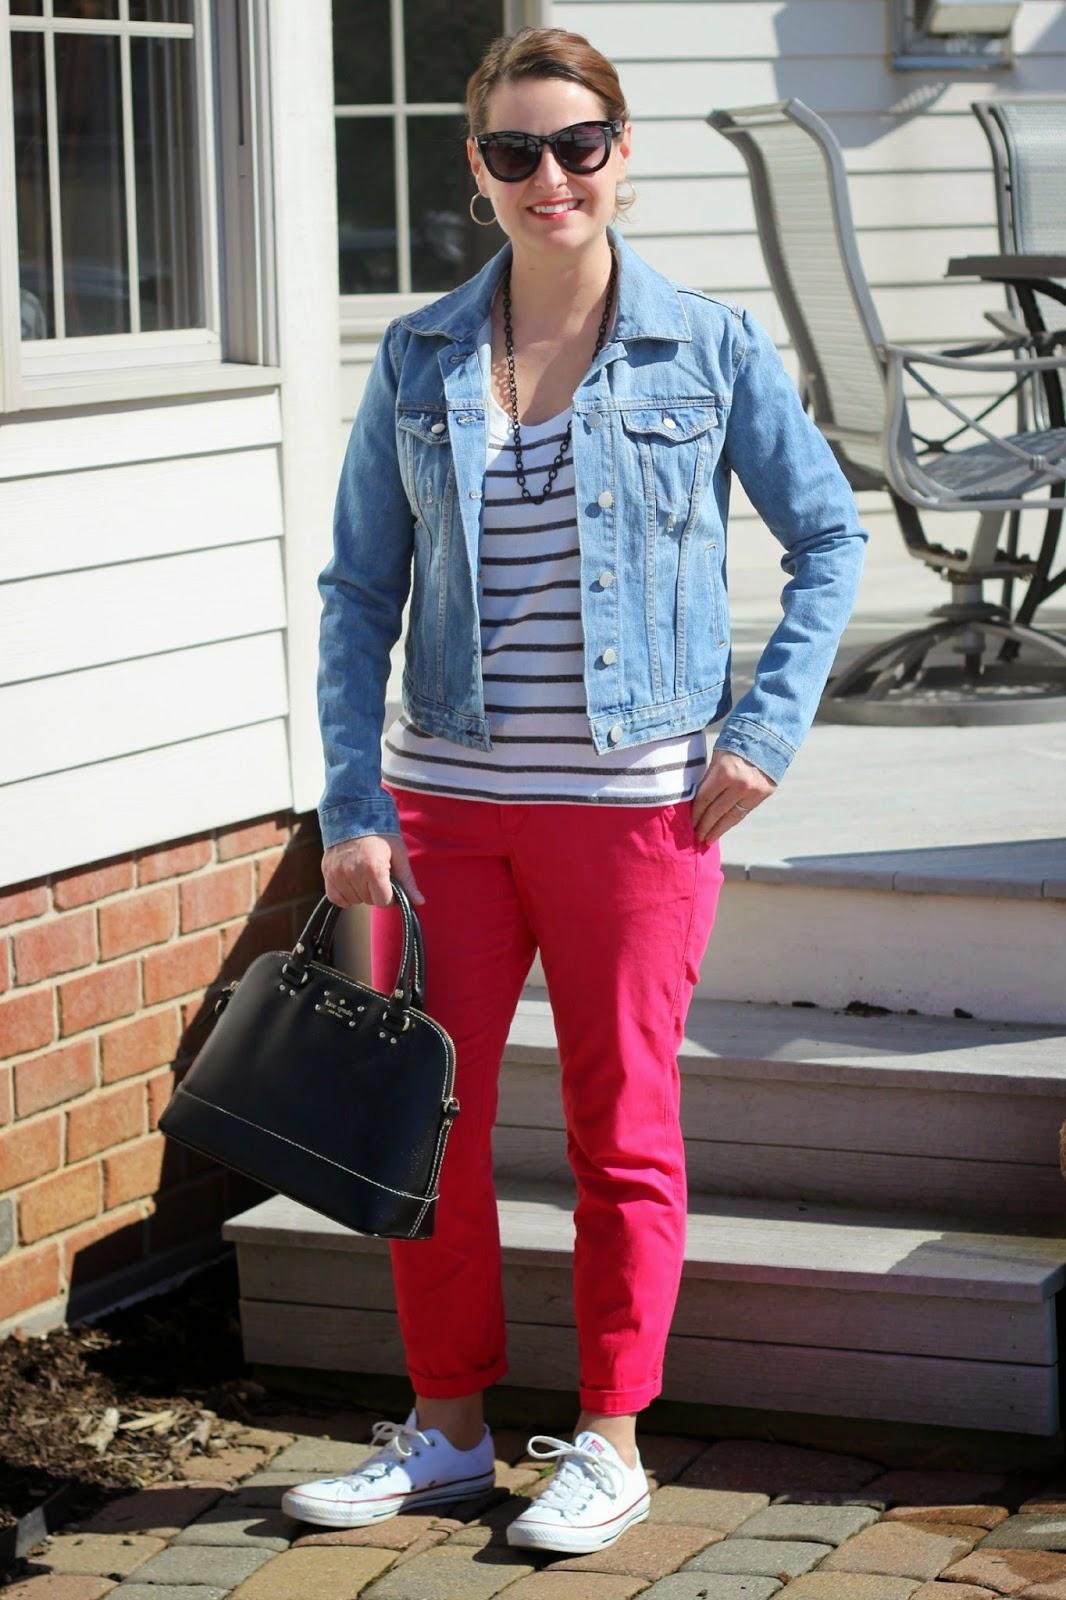 Spring look, red chinos, converse, denim jacket, kate spade bag, stripes